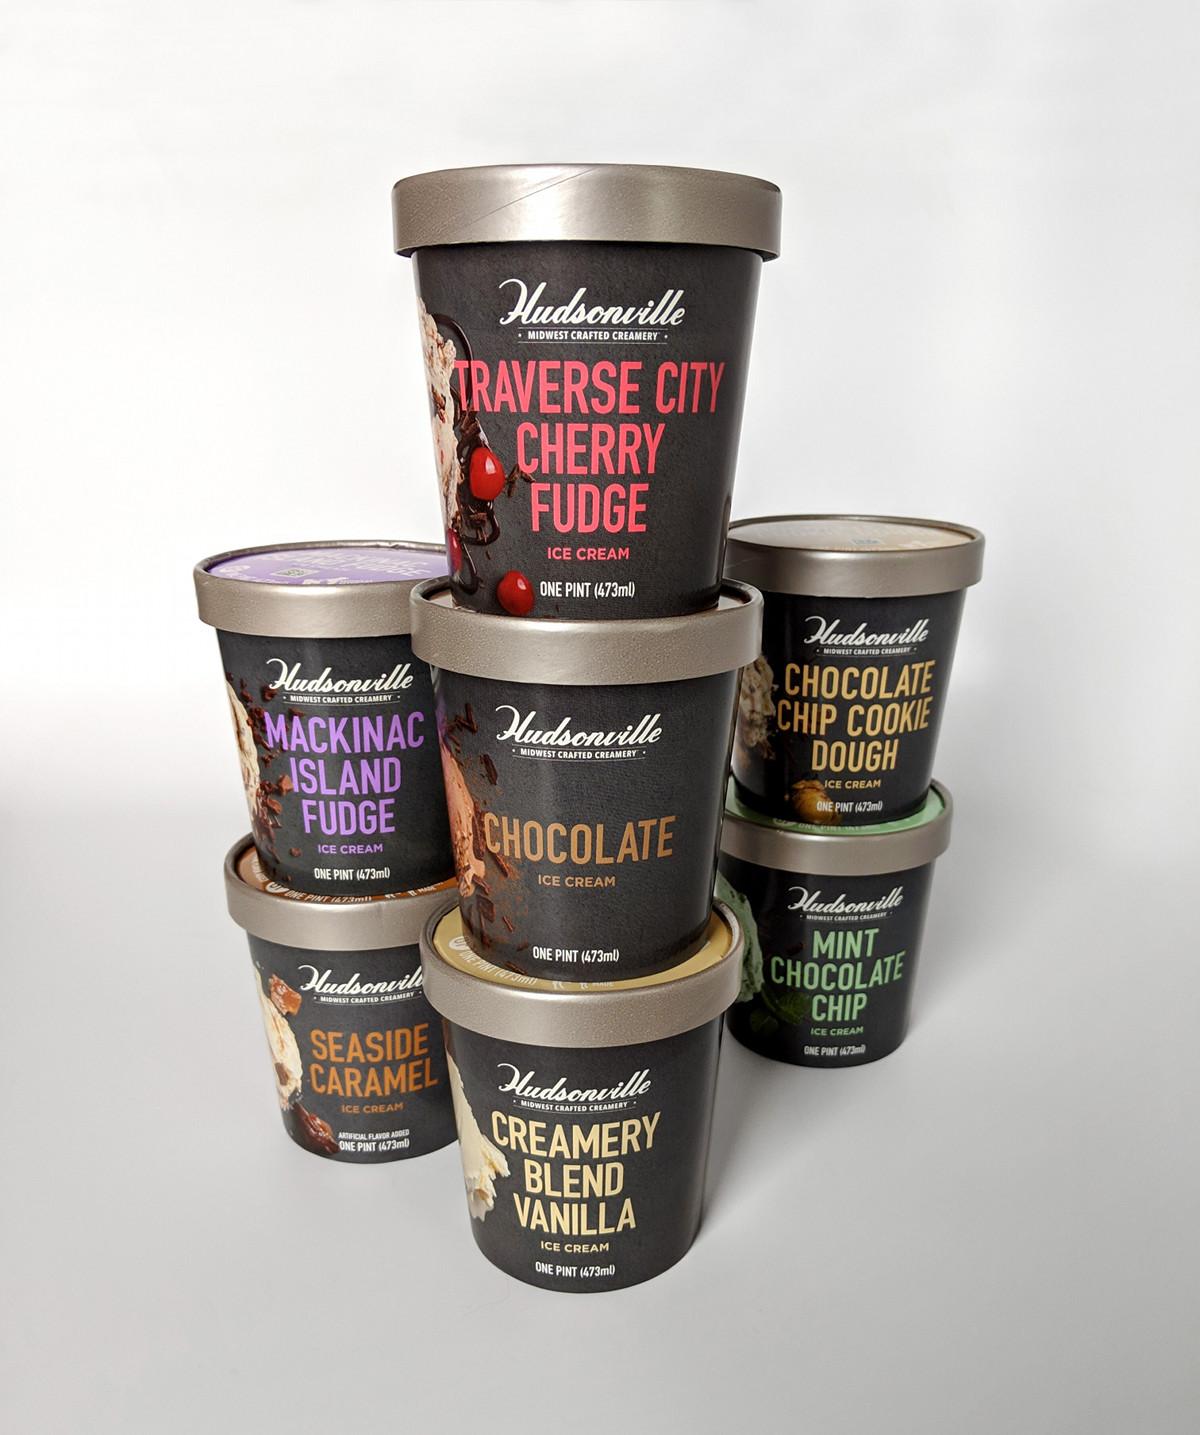 Hudsonville Ice Cream pint flavors